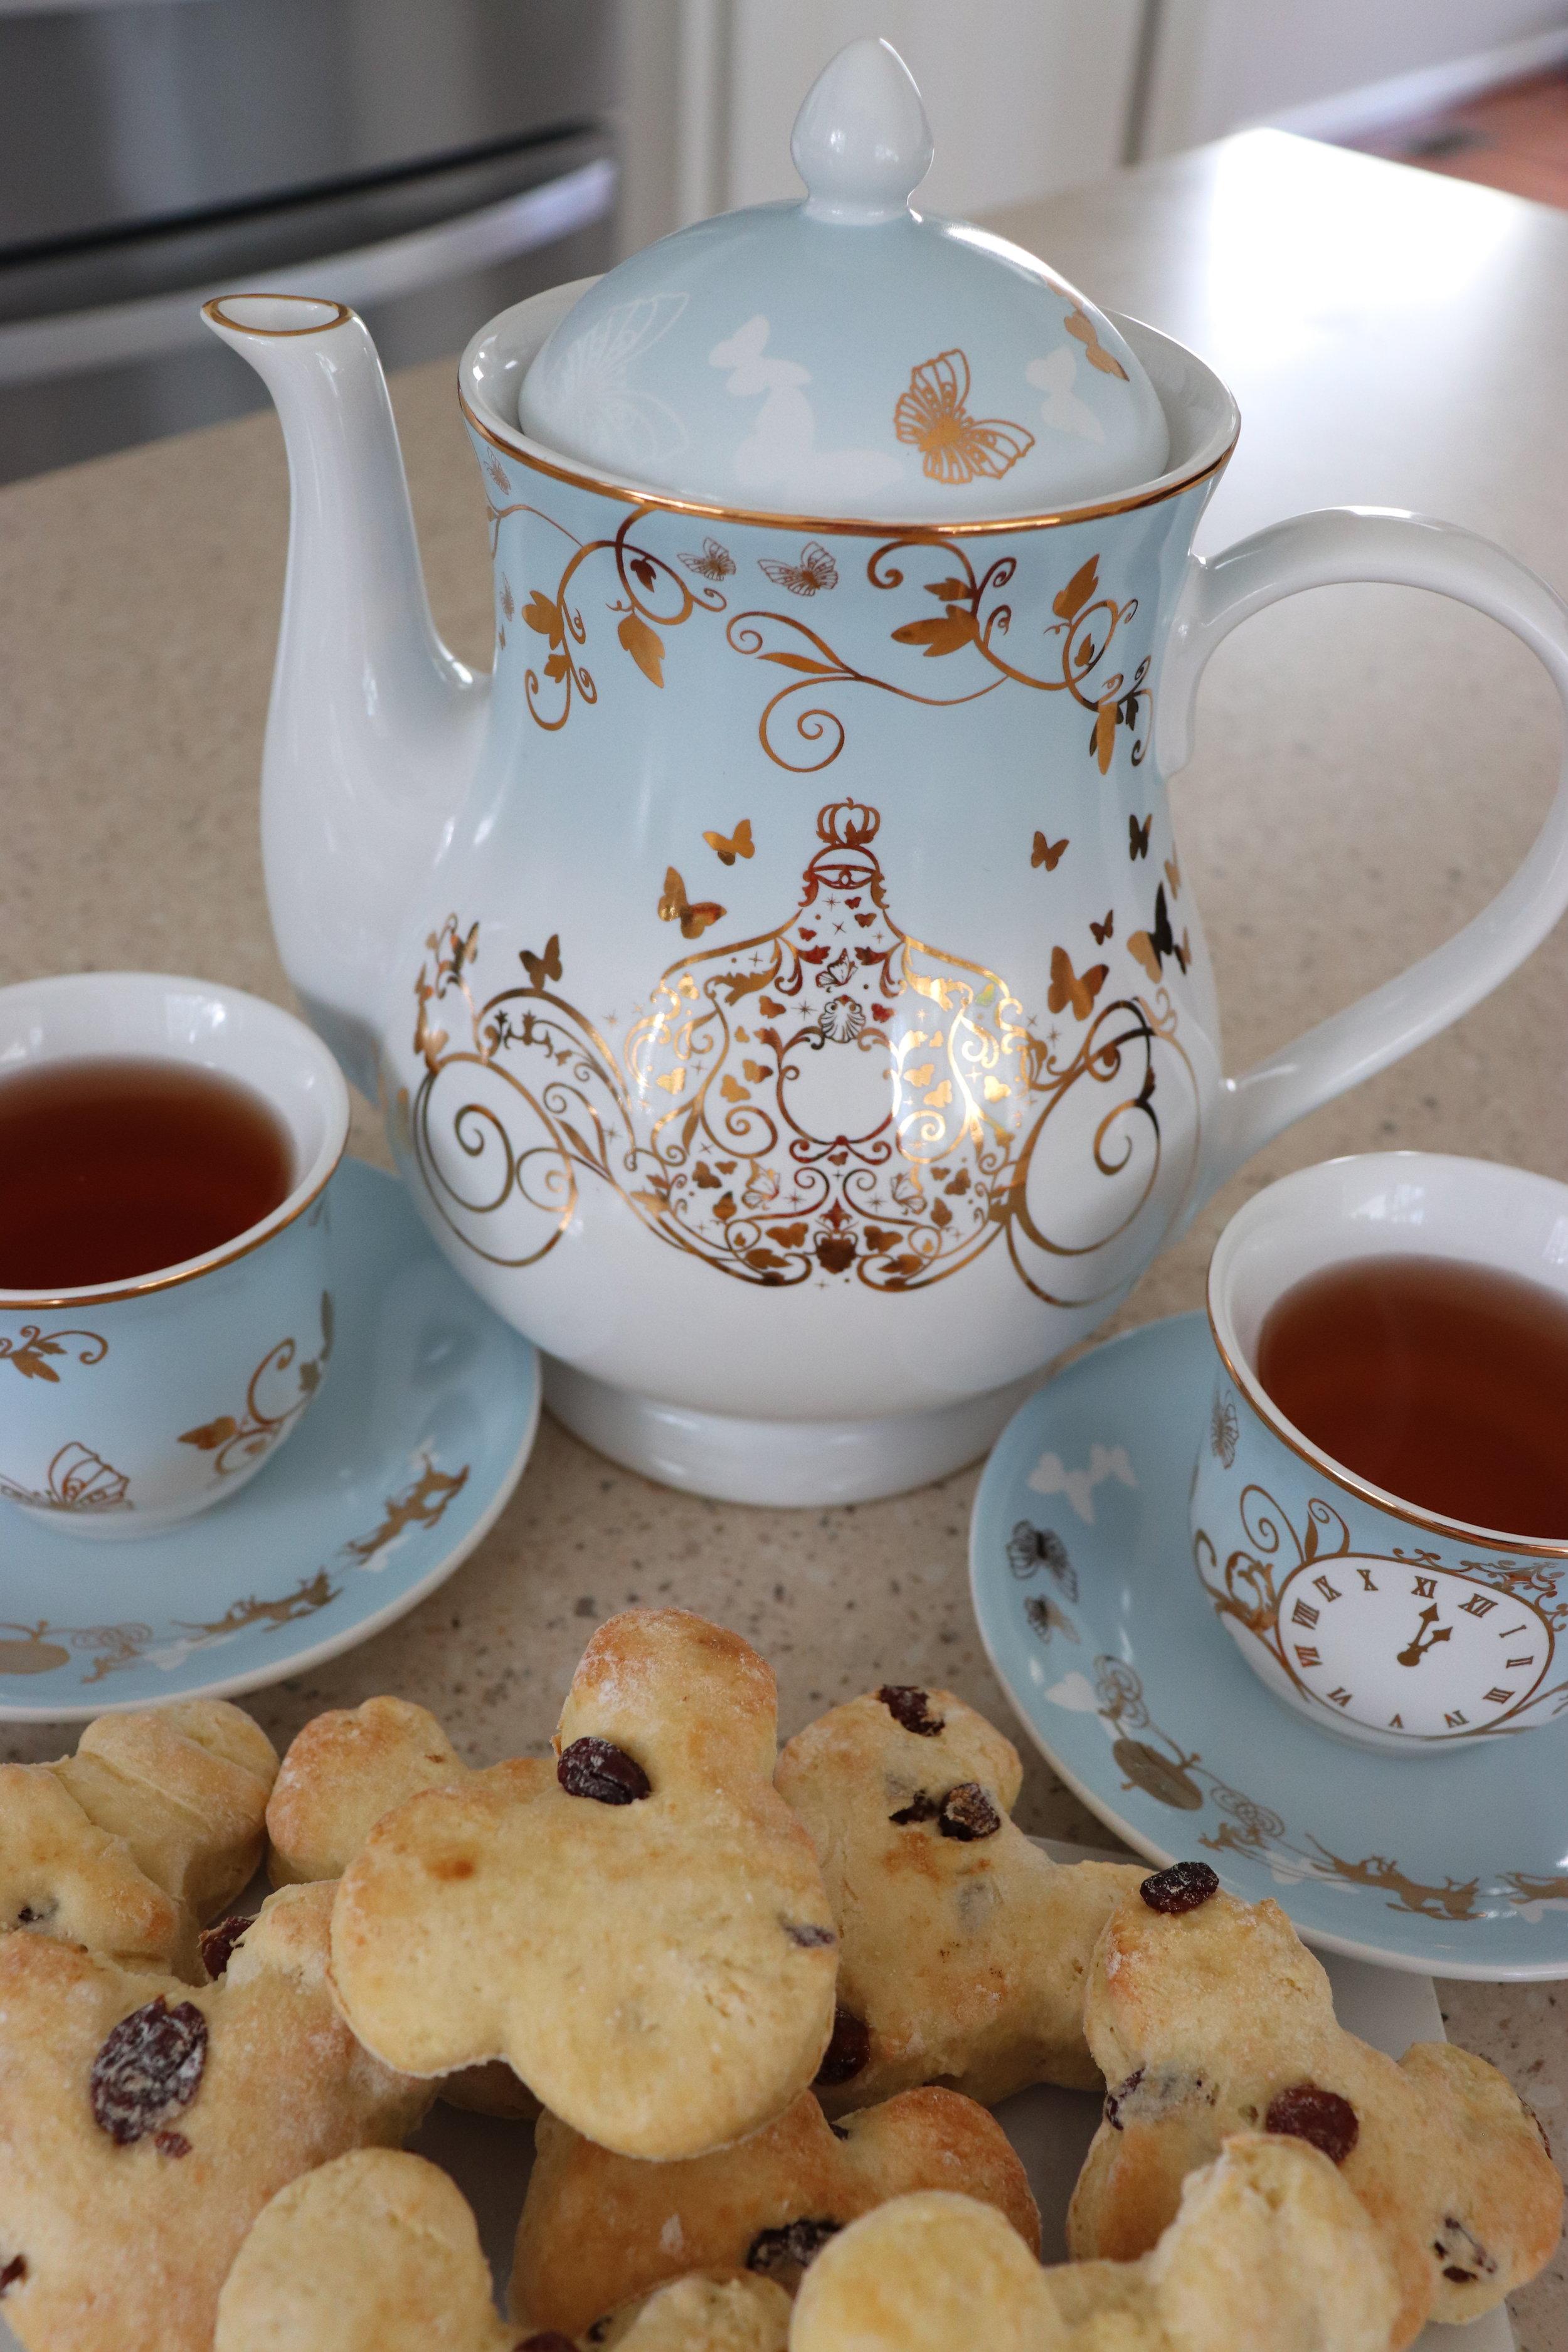 Julie's beautiful Cinderella tea set.